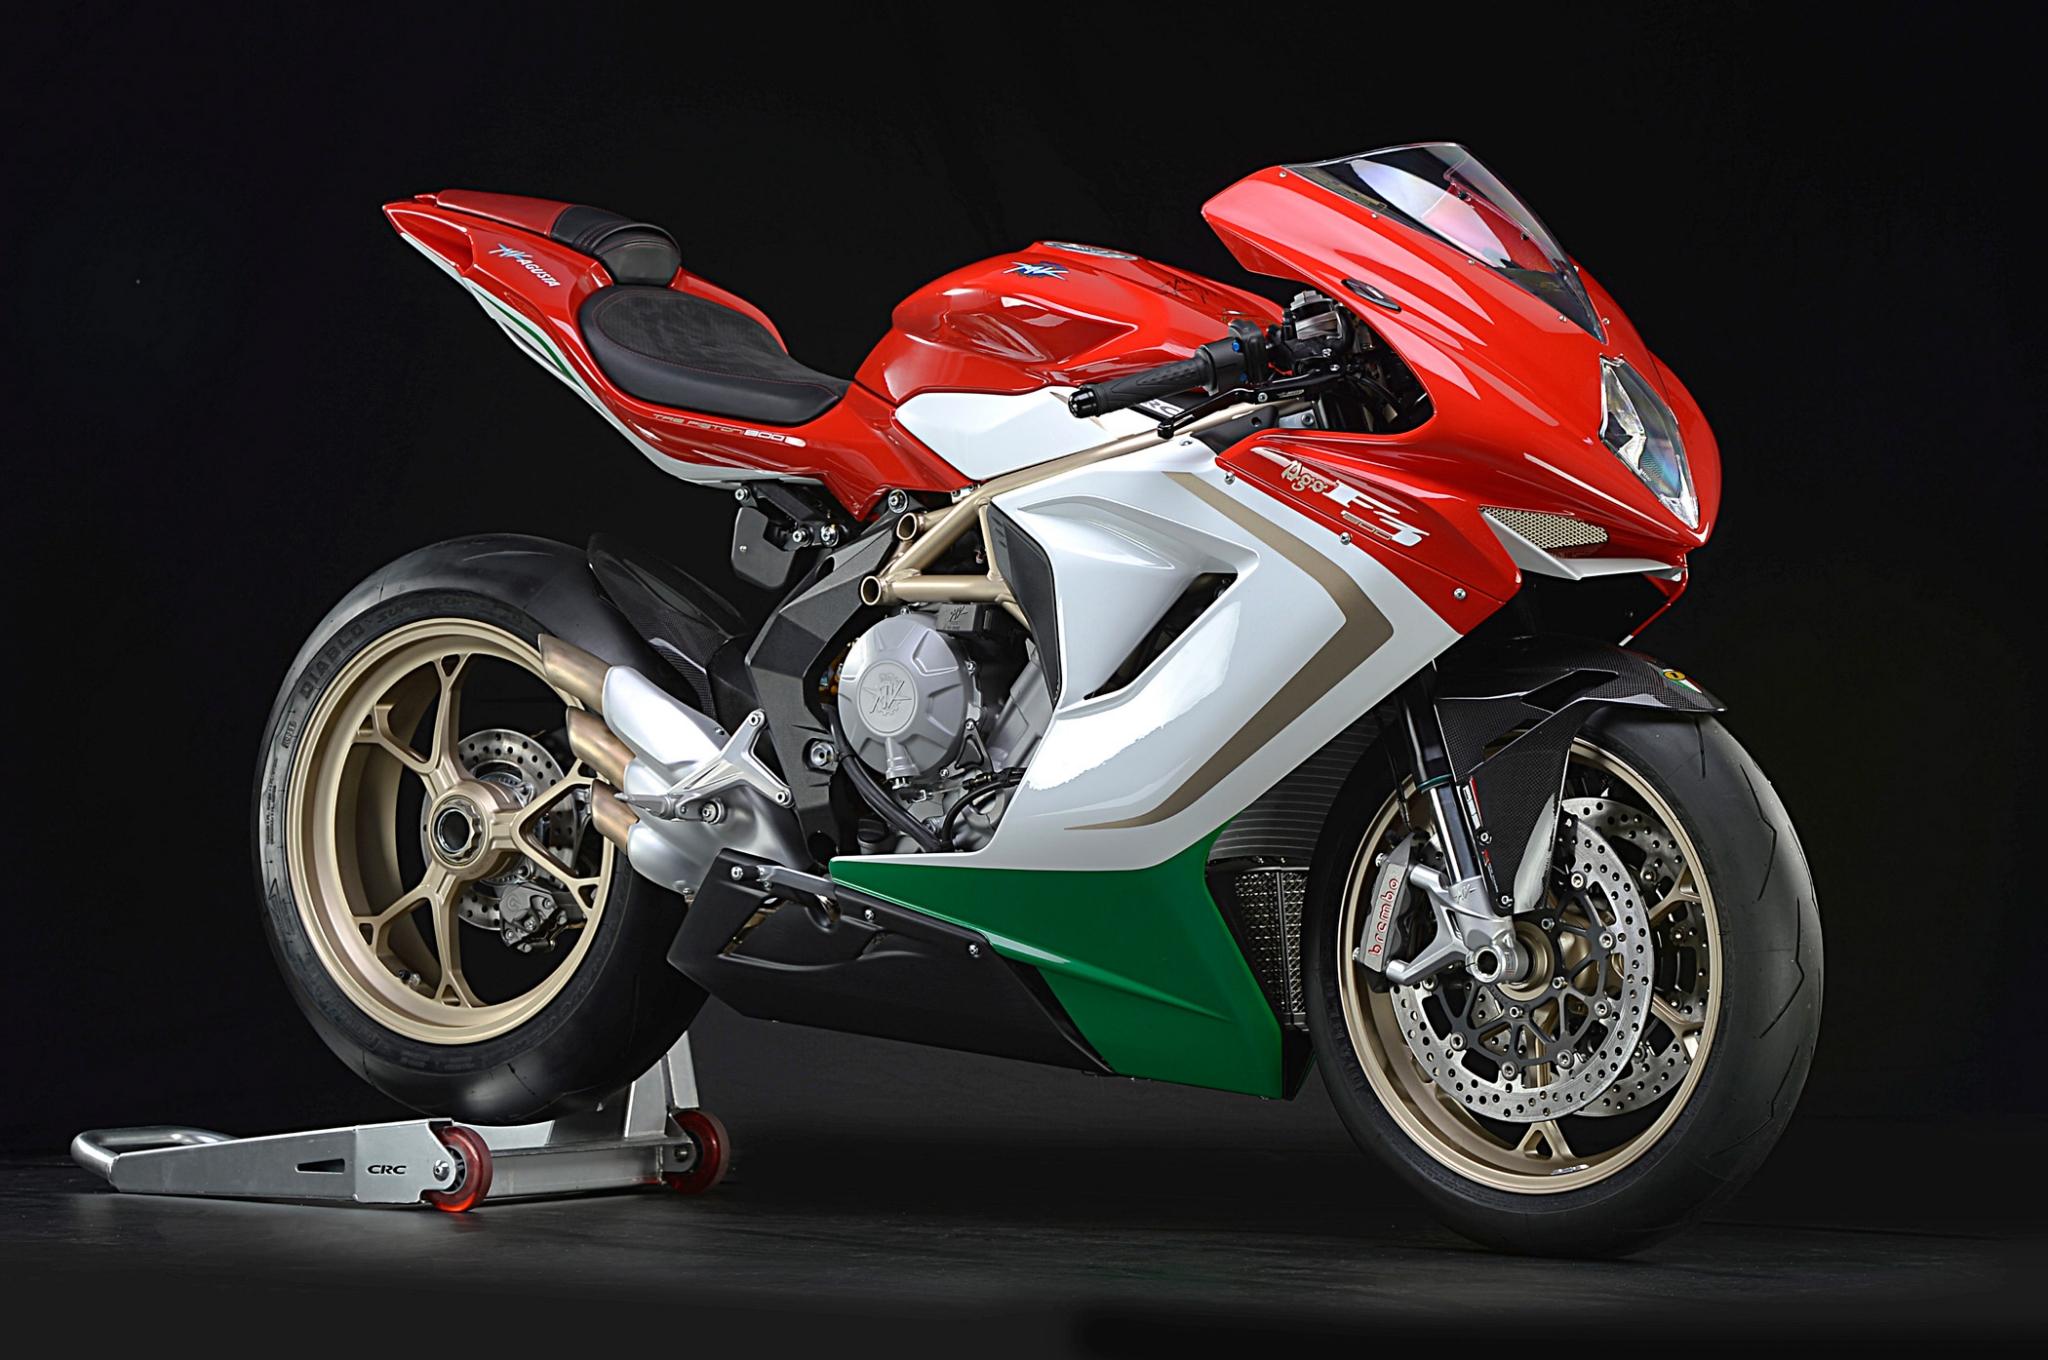 mv agusta f3 800 ago giacomo agostini tribute race bike unveiled autoevolution. Black Bedroom Furniture Sets. Home Design Ideas